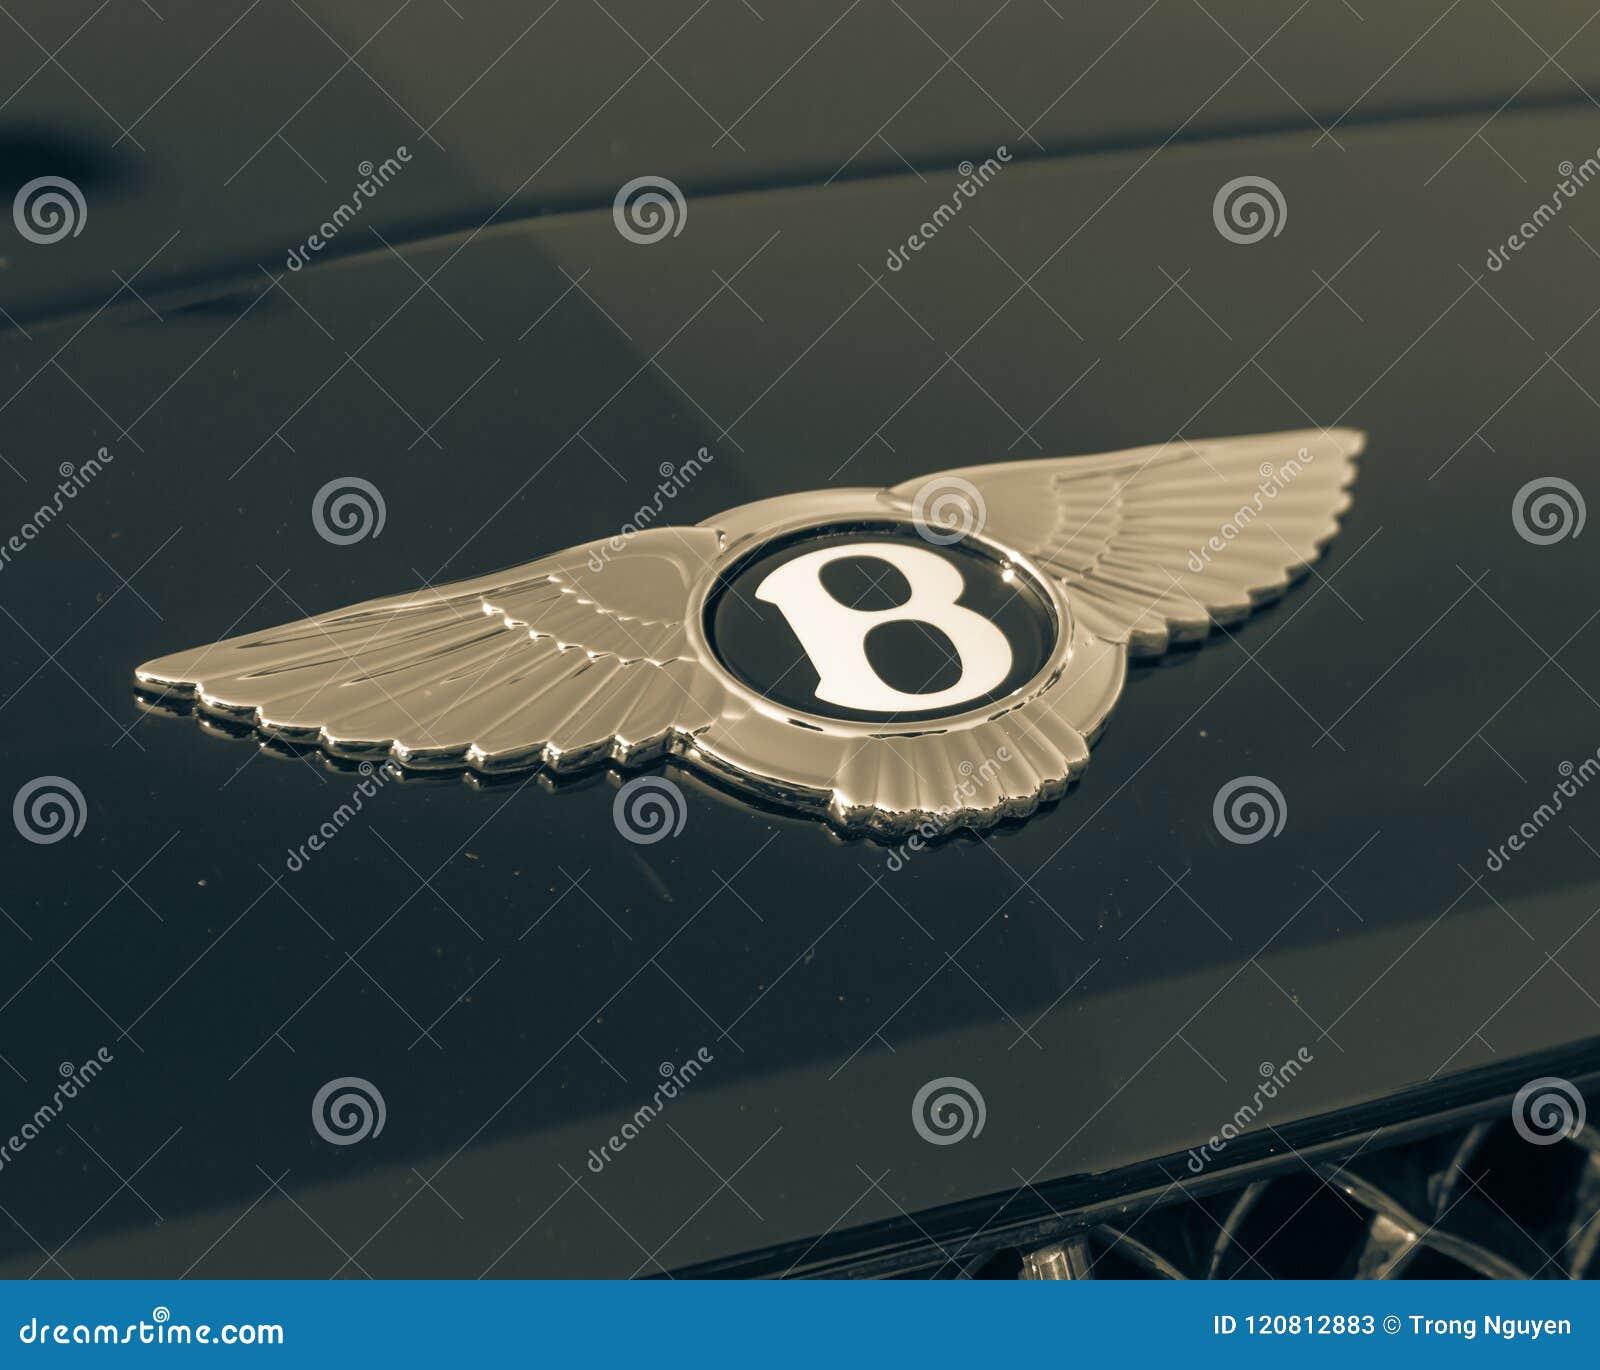 Vintage Tone Logo Of Bentley Luxury Car Brand Editorial Stock Photo